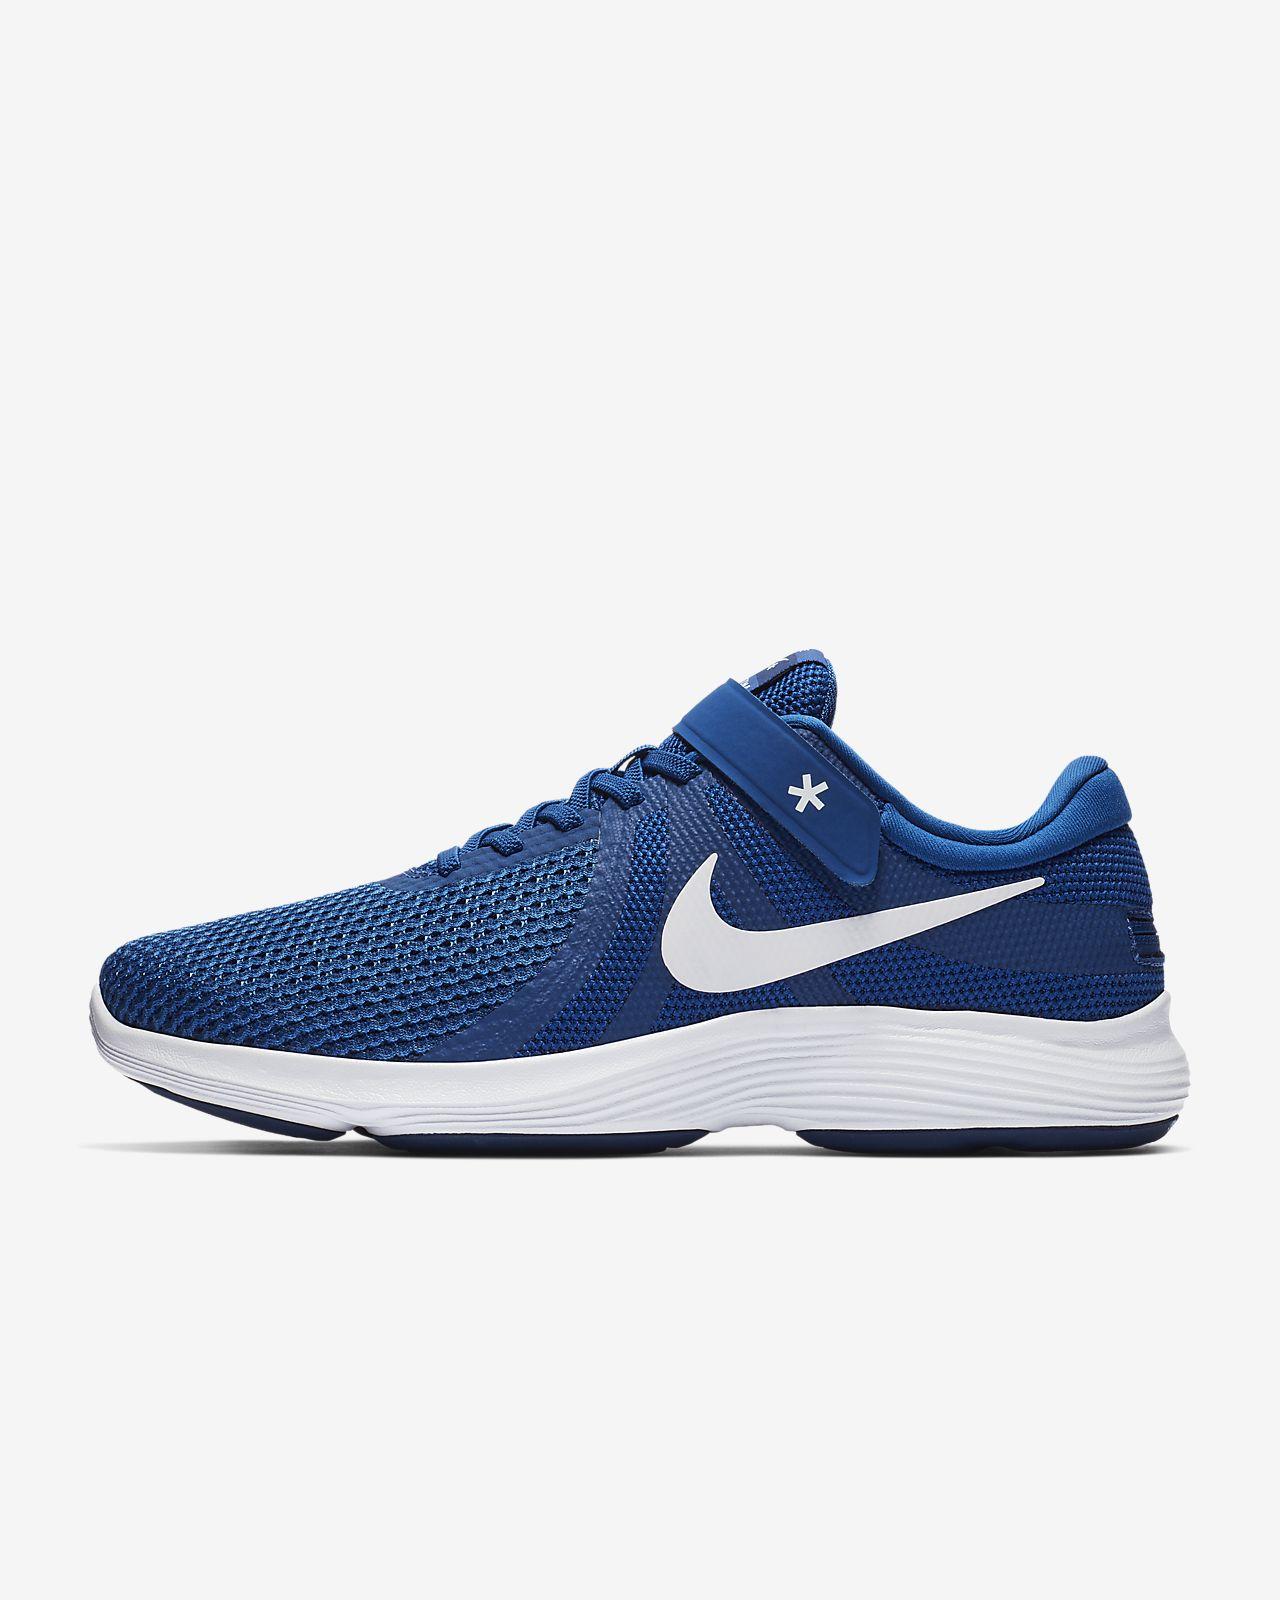 sale retailer 00649 1a802 Men s Running Shoe (Extra-Wide). Nike Revolution 4 FlyEase